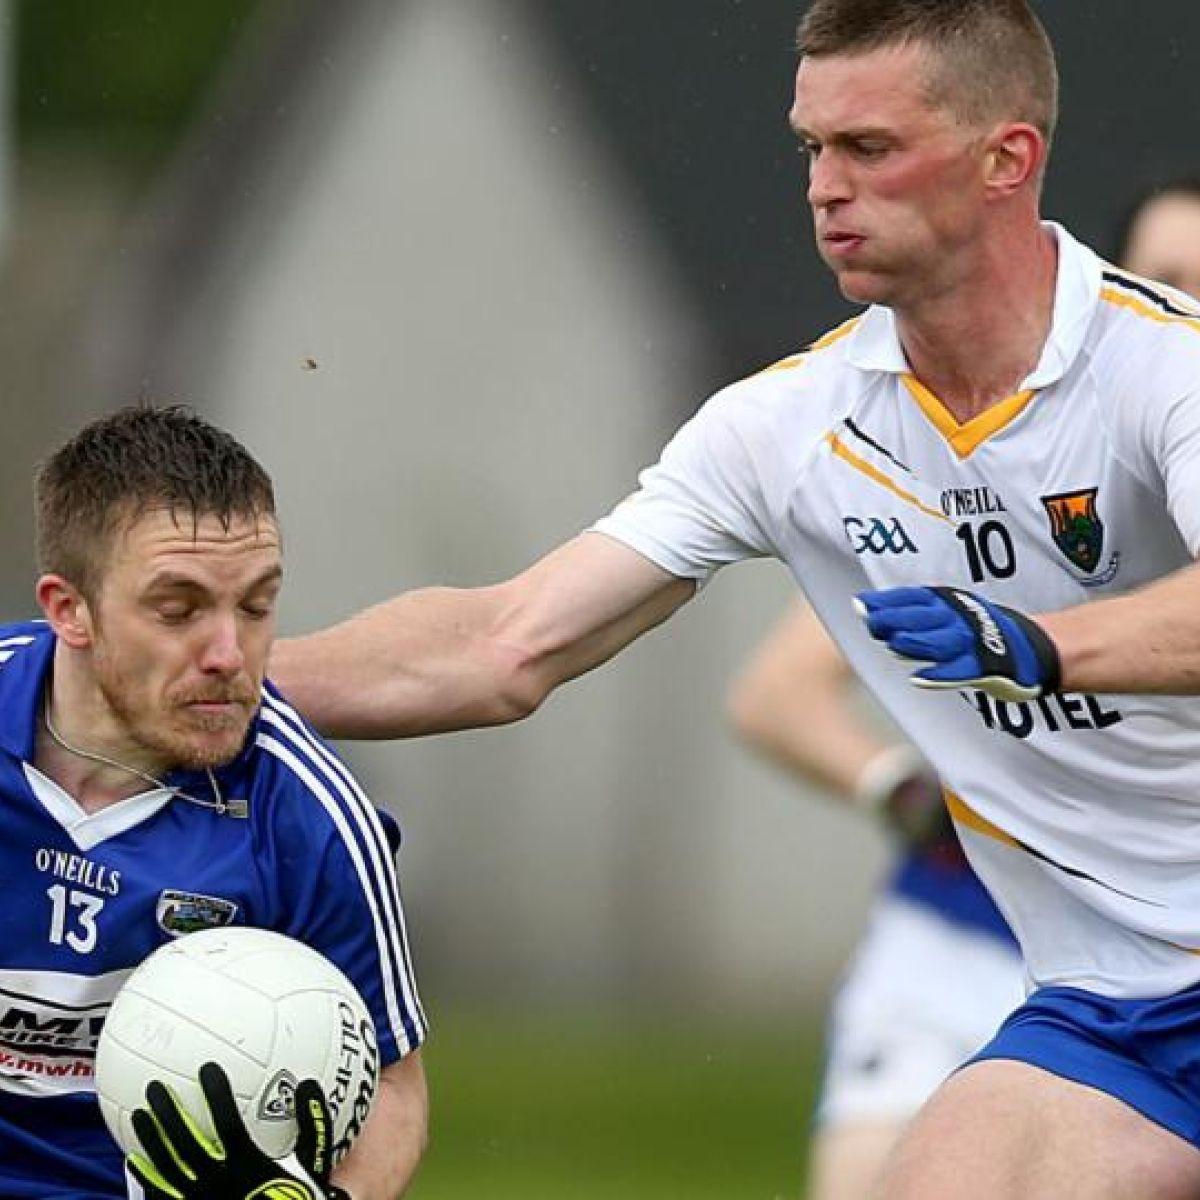 Laois GAA propose slight change to senior club hurling